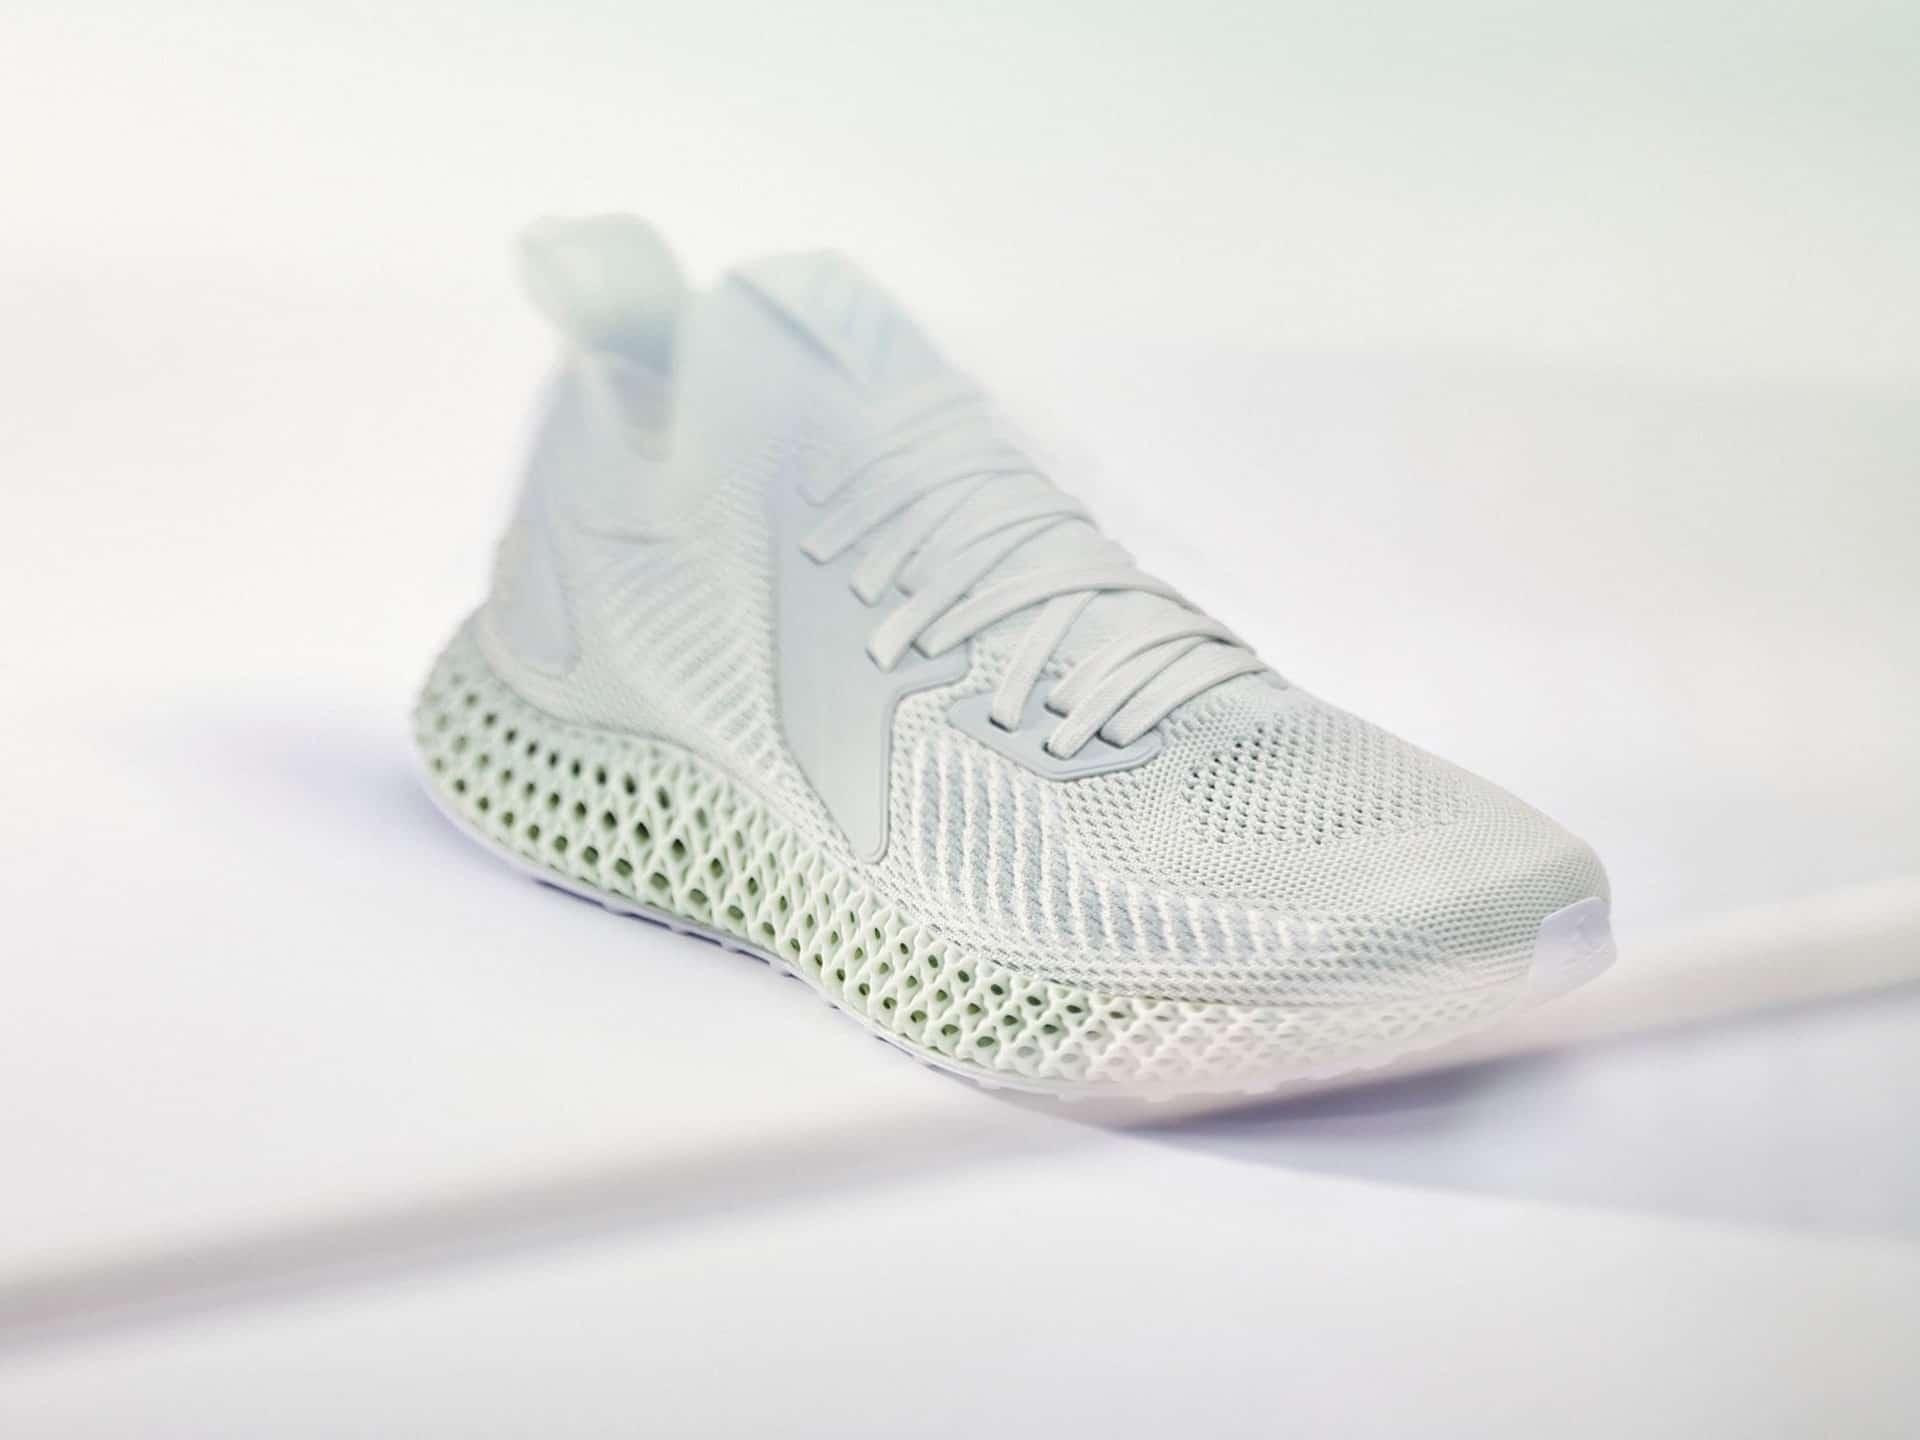 Parley x Adidas AlphaEdge 4D